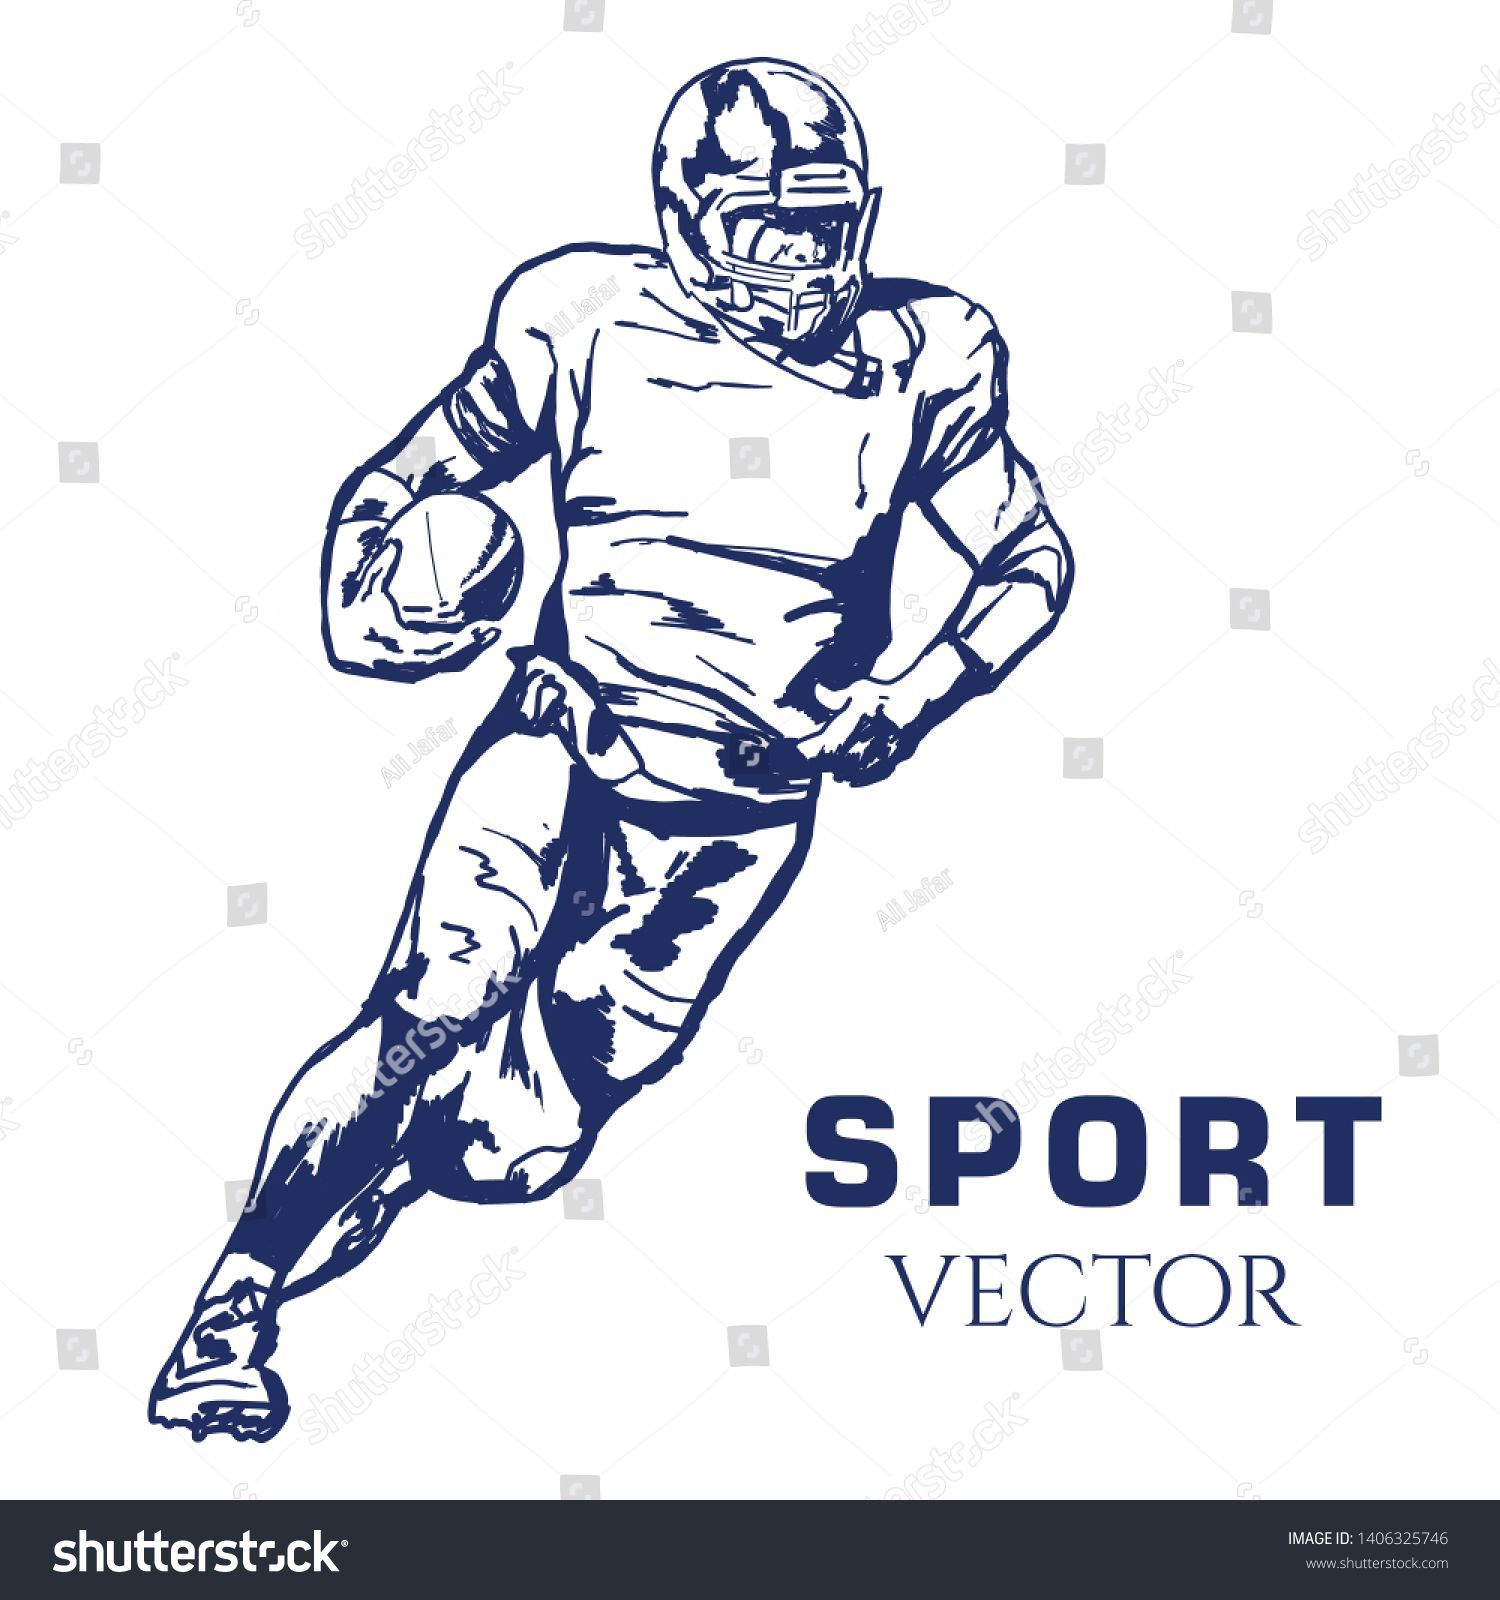 American Football Vector Sport Vector Stock Vector Royalty Free 1406325746 American Americanfootballaesthetic Football Free Royalty Sport Stock Vect In 2020